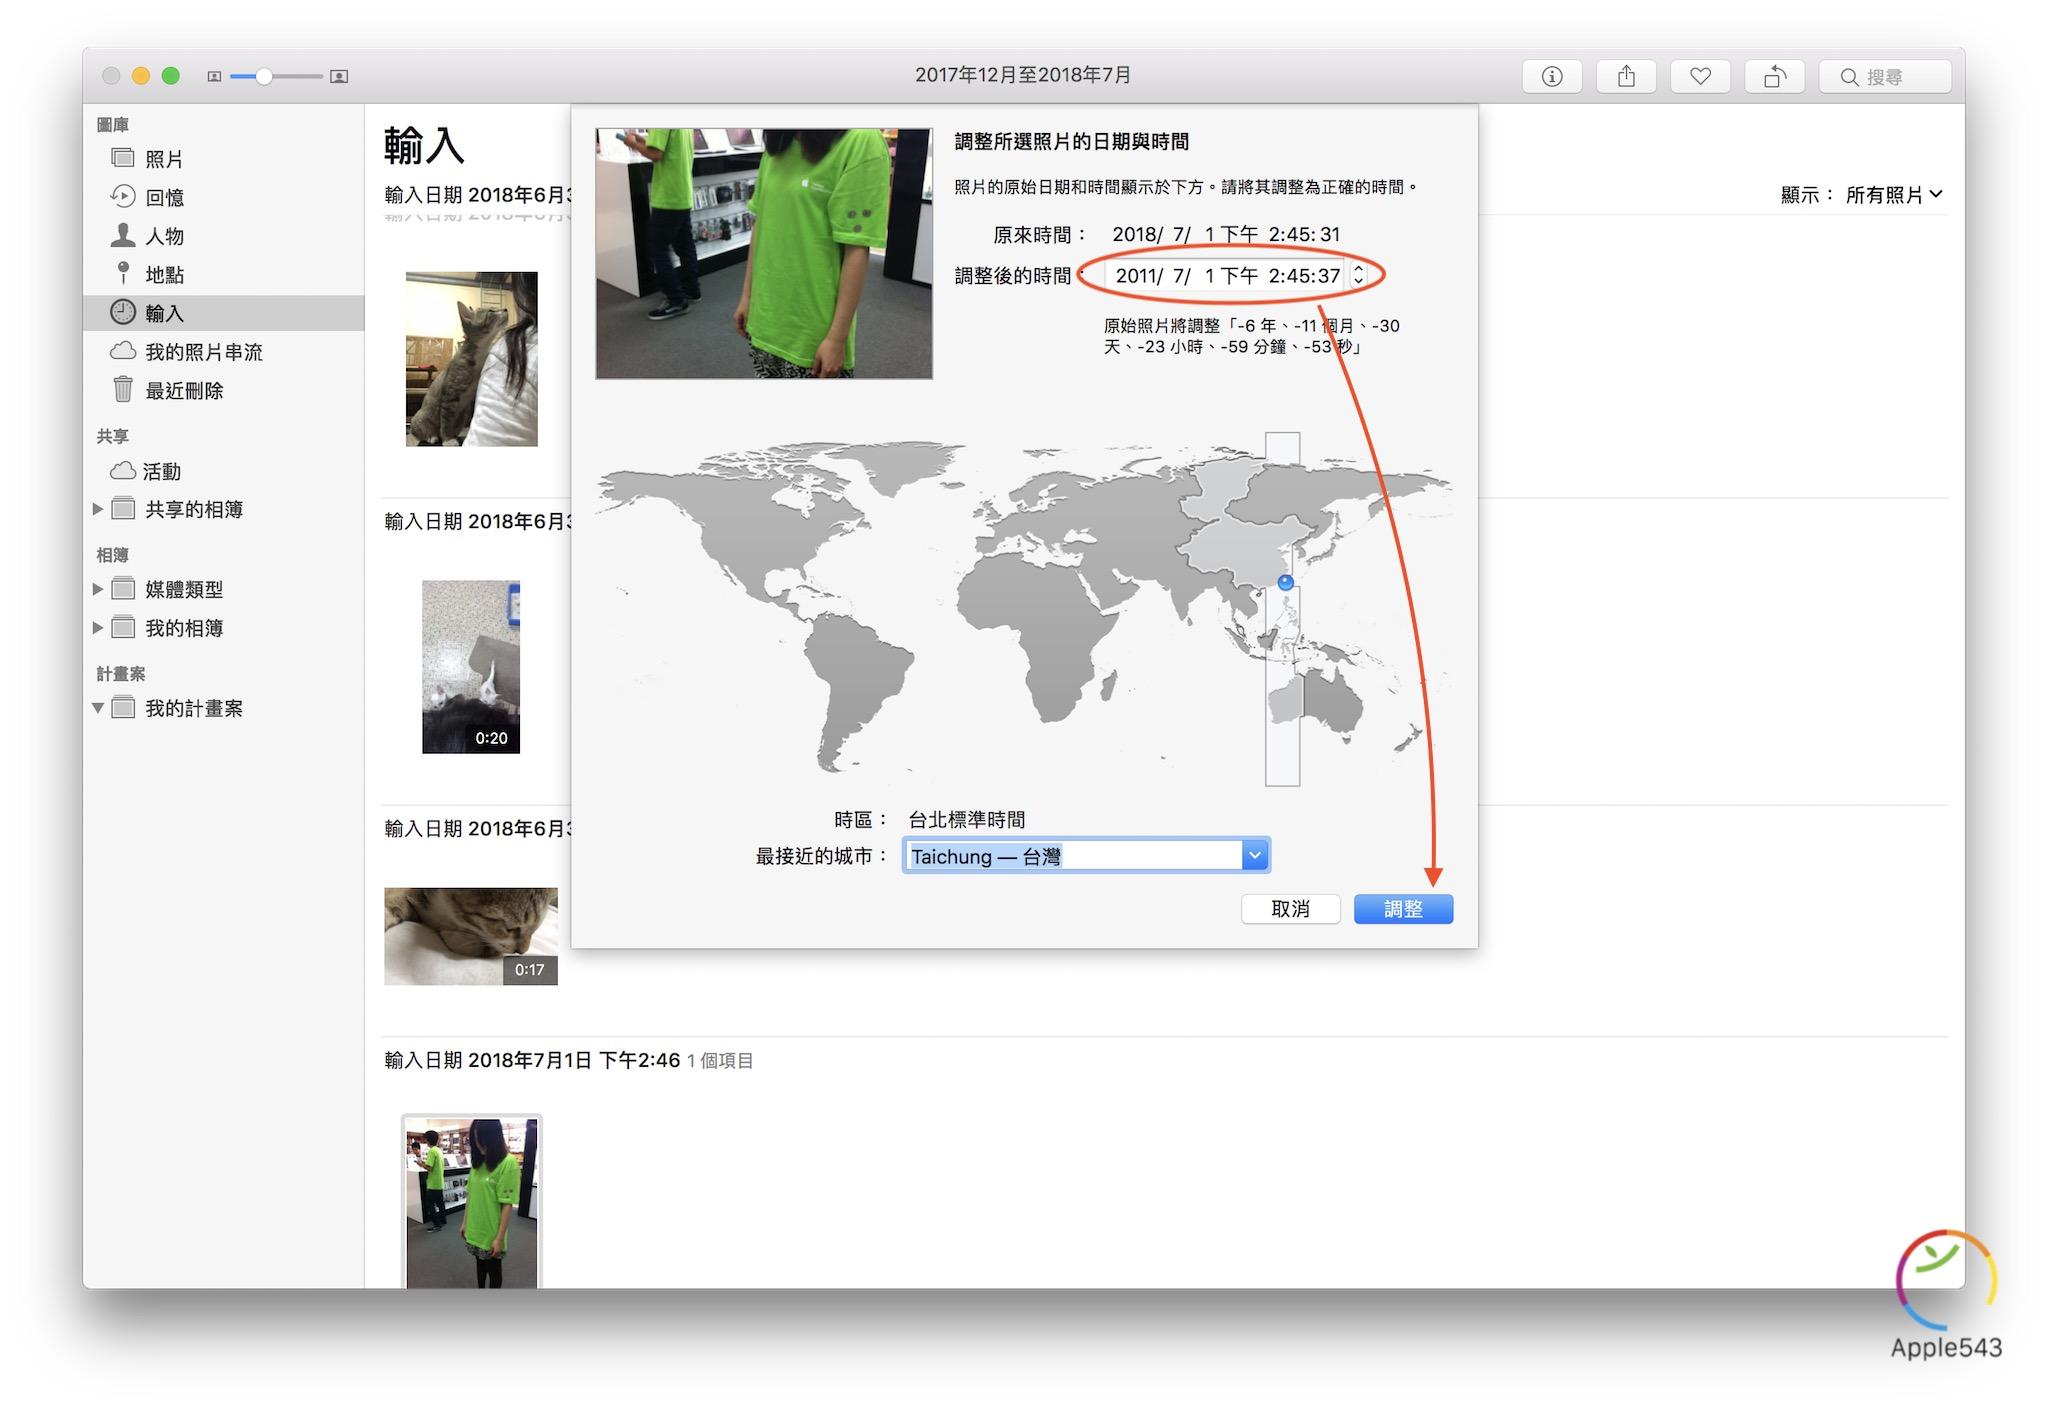 Mac 照片日期